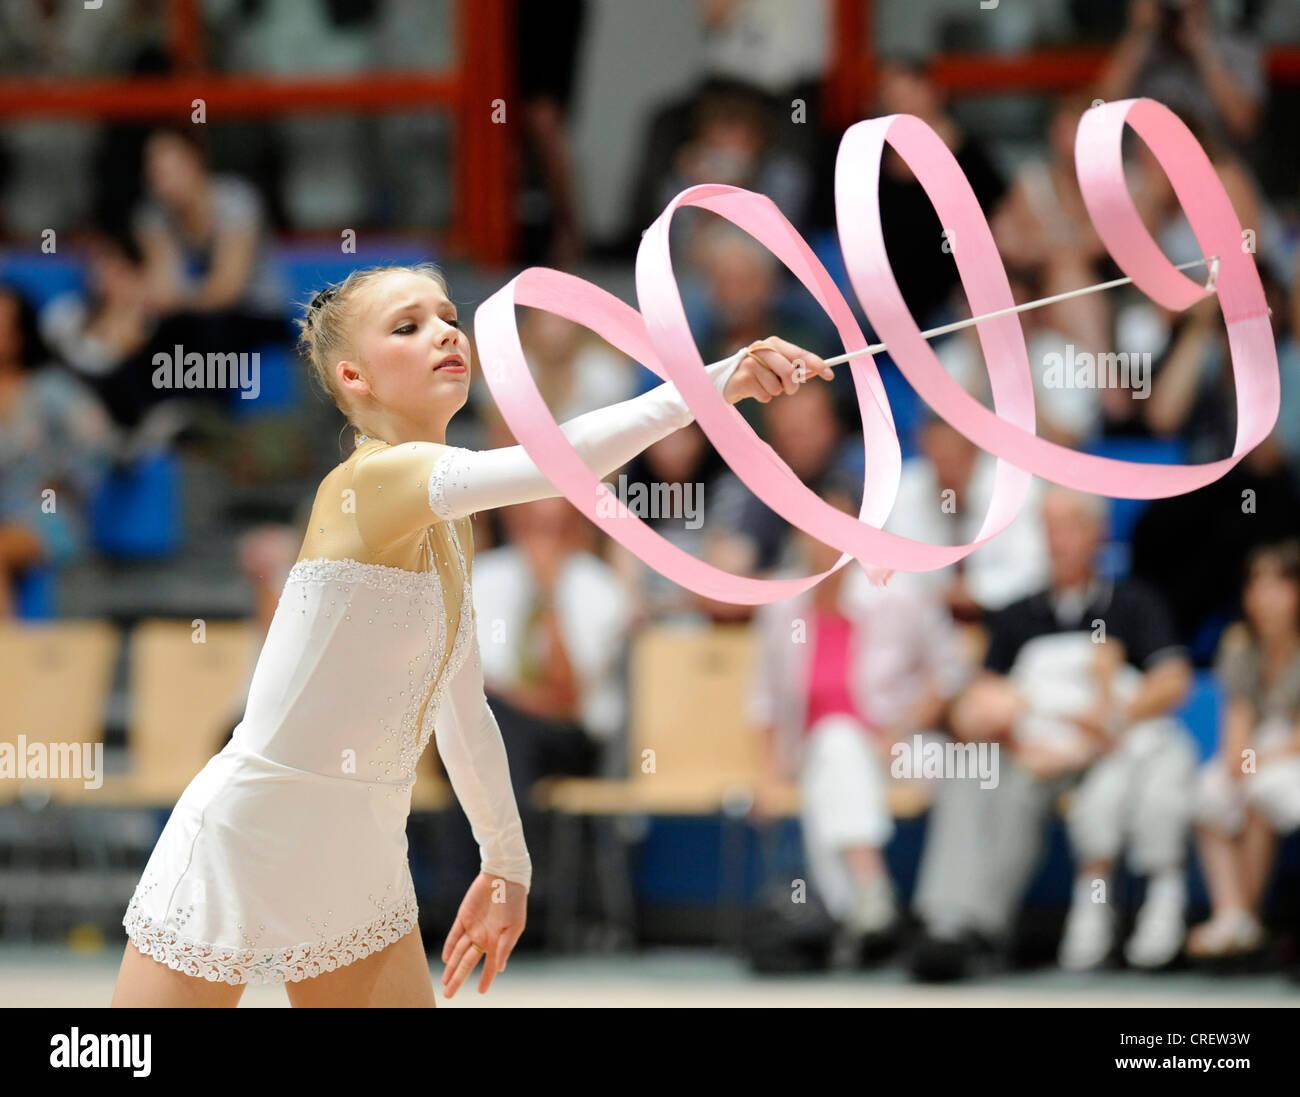 woman doing rhythmic gymnastics with ribbon - Stock Image